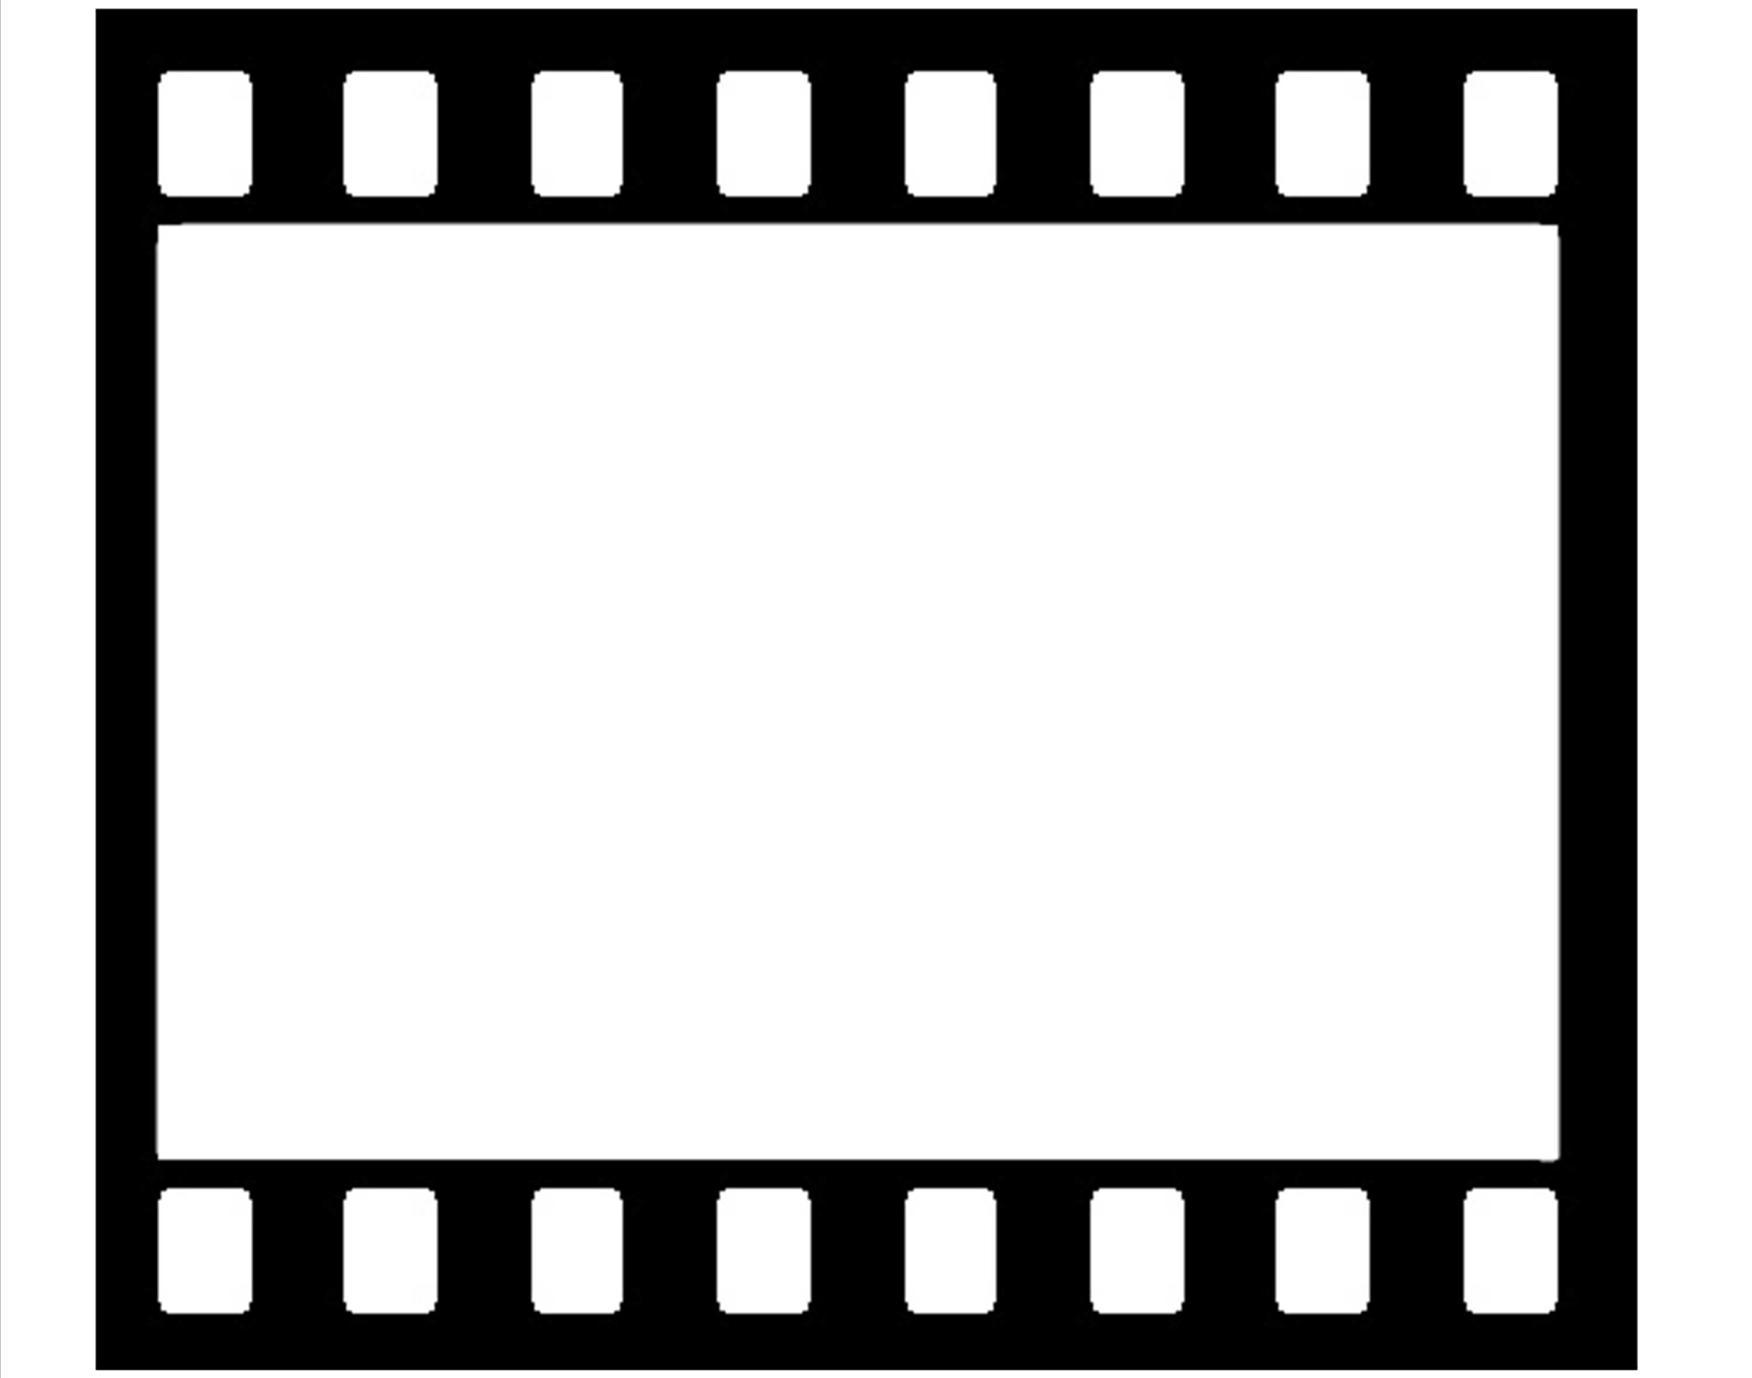 Movie Film Strip Clipart Free Clip Art Images